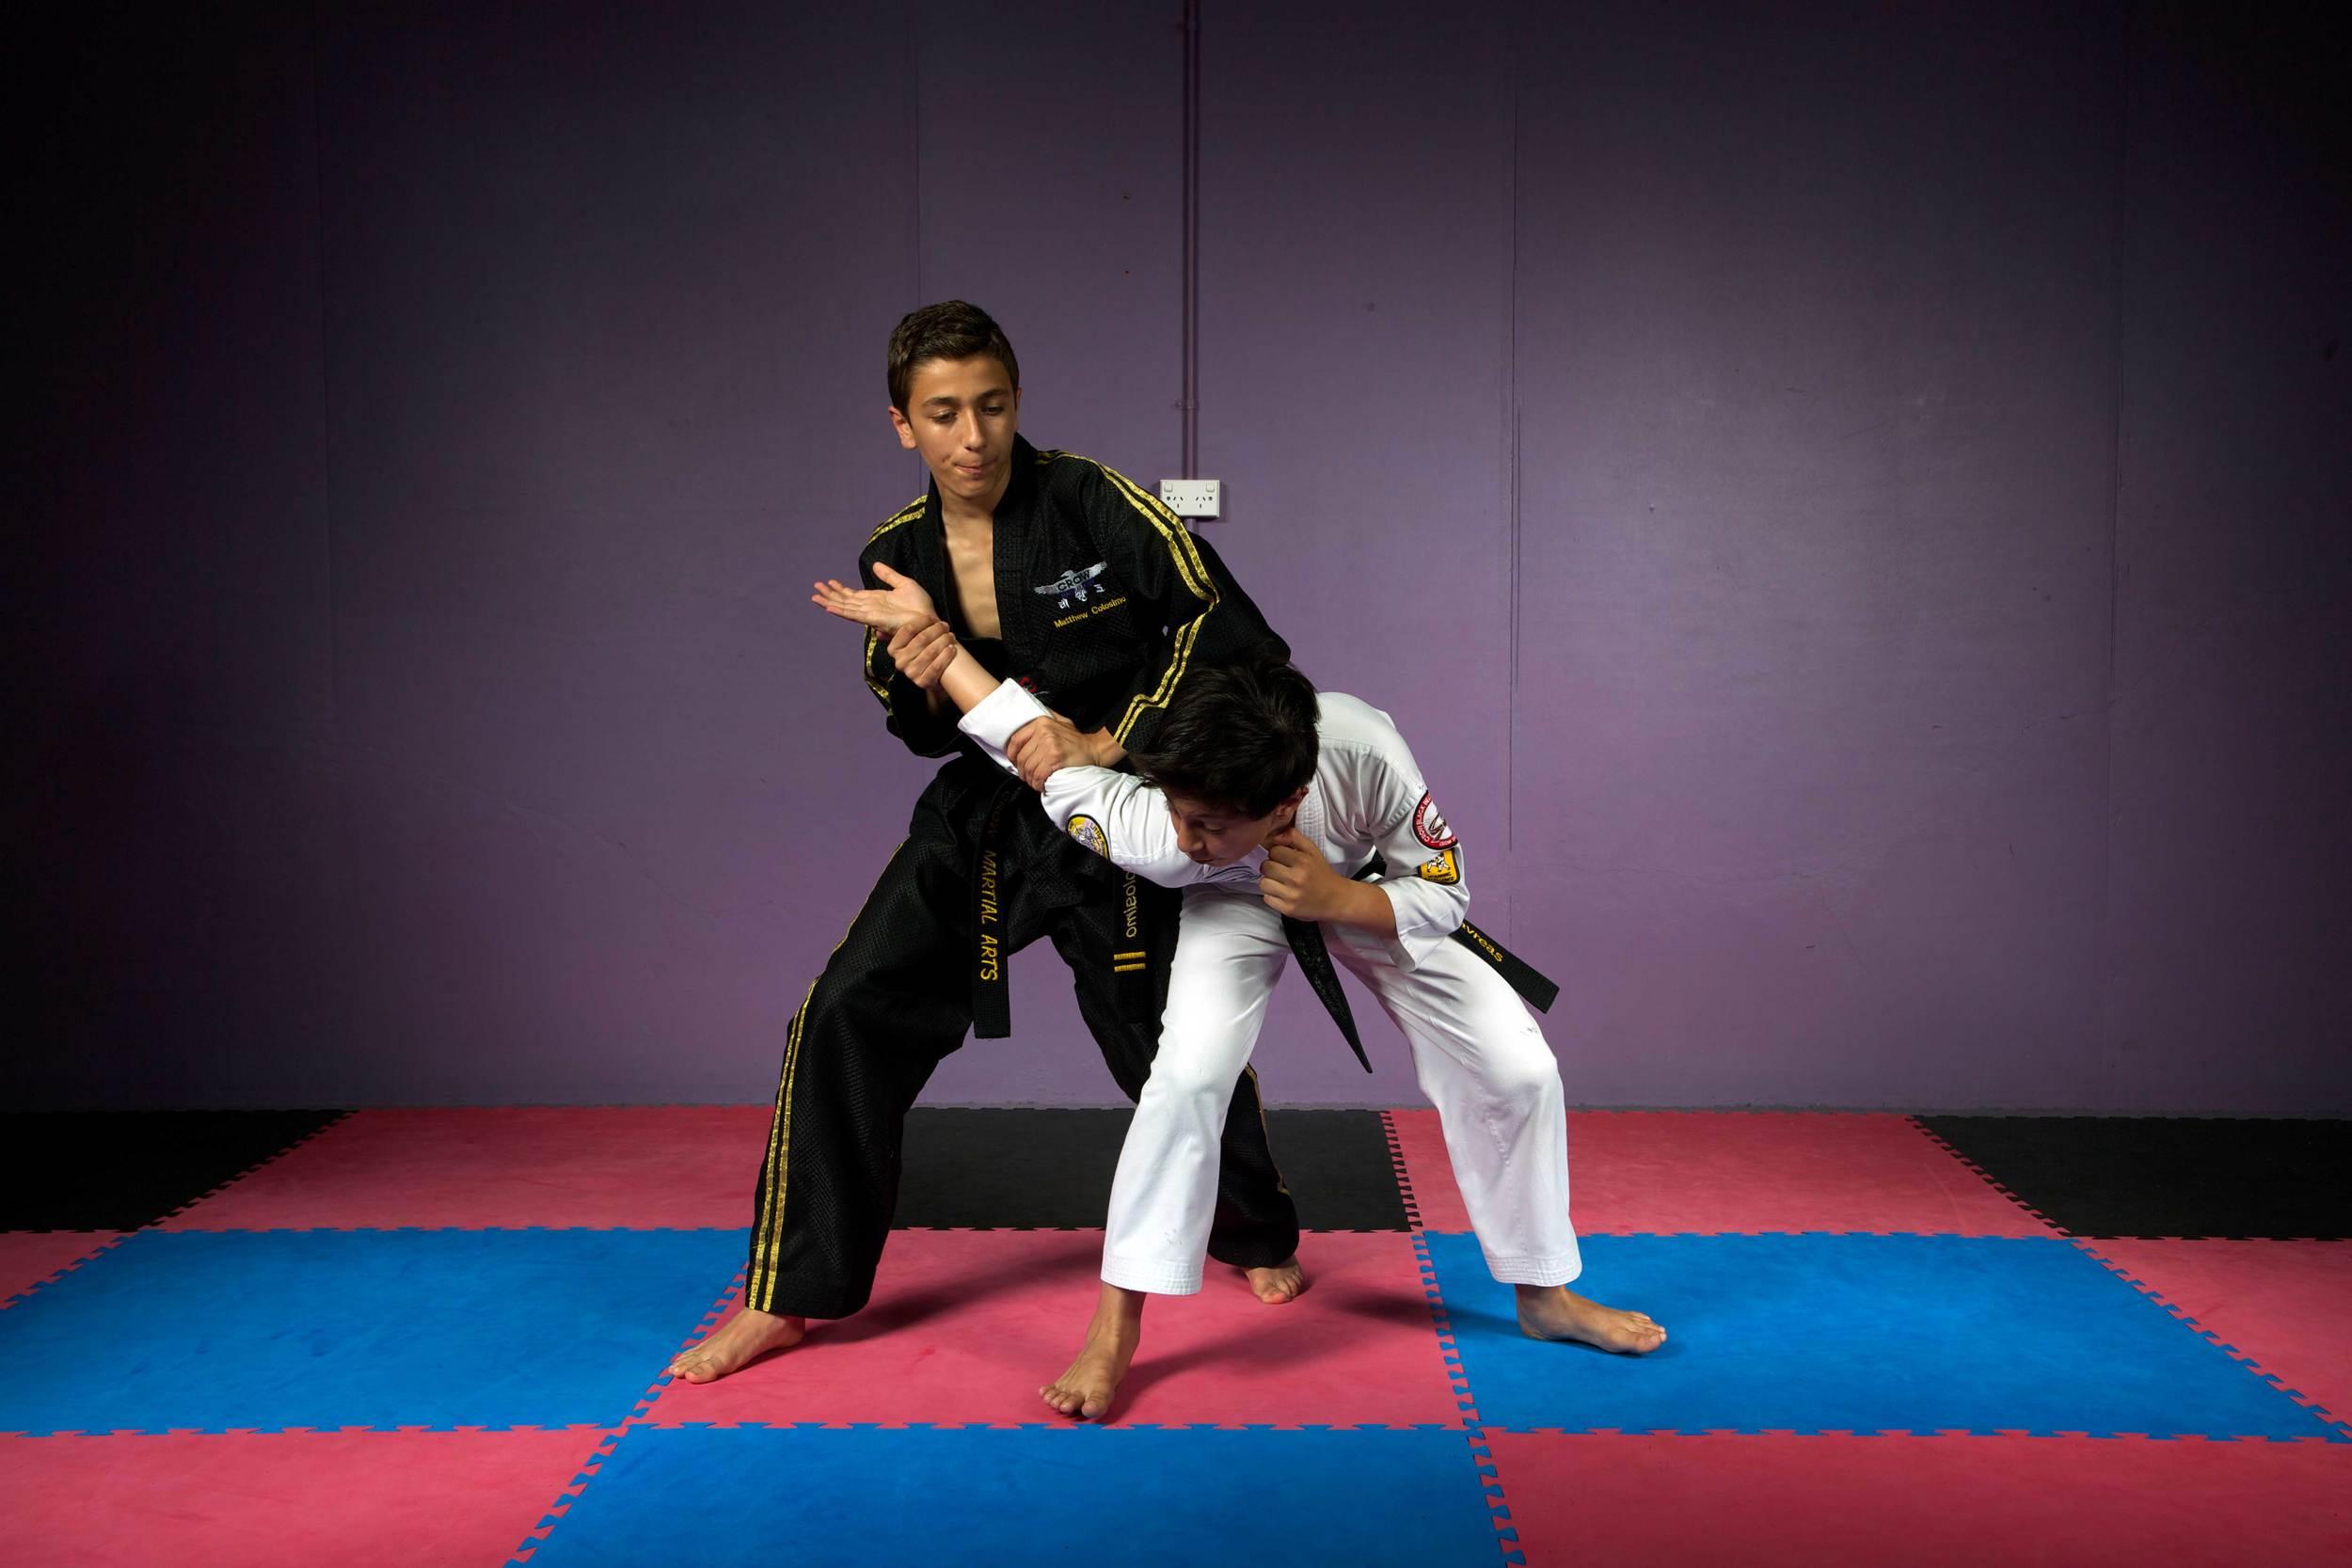 Self-defence for kids